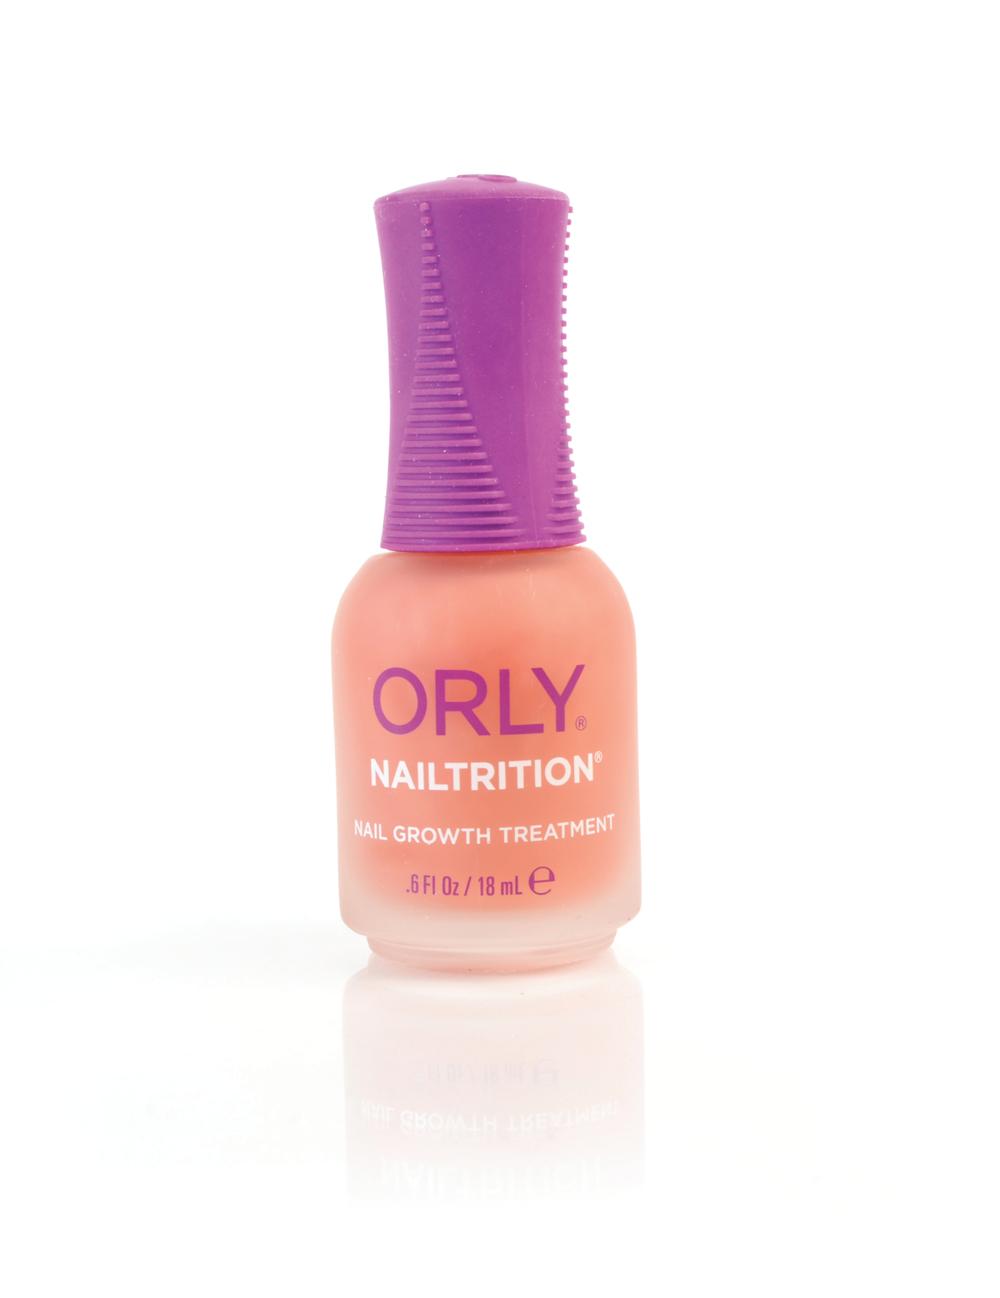 "<p>Orly Nailtrition Nail Growth Treatment<br /><a href=""http://www.orlybeauty.com"">www.orlybeauty.com</a></p>"